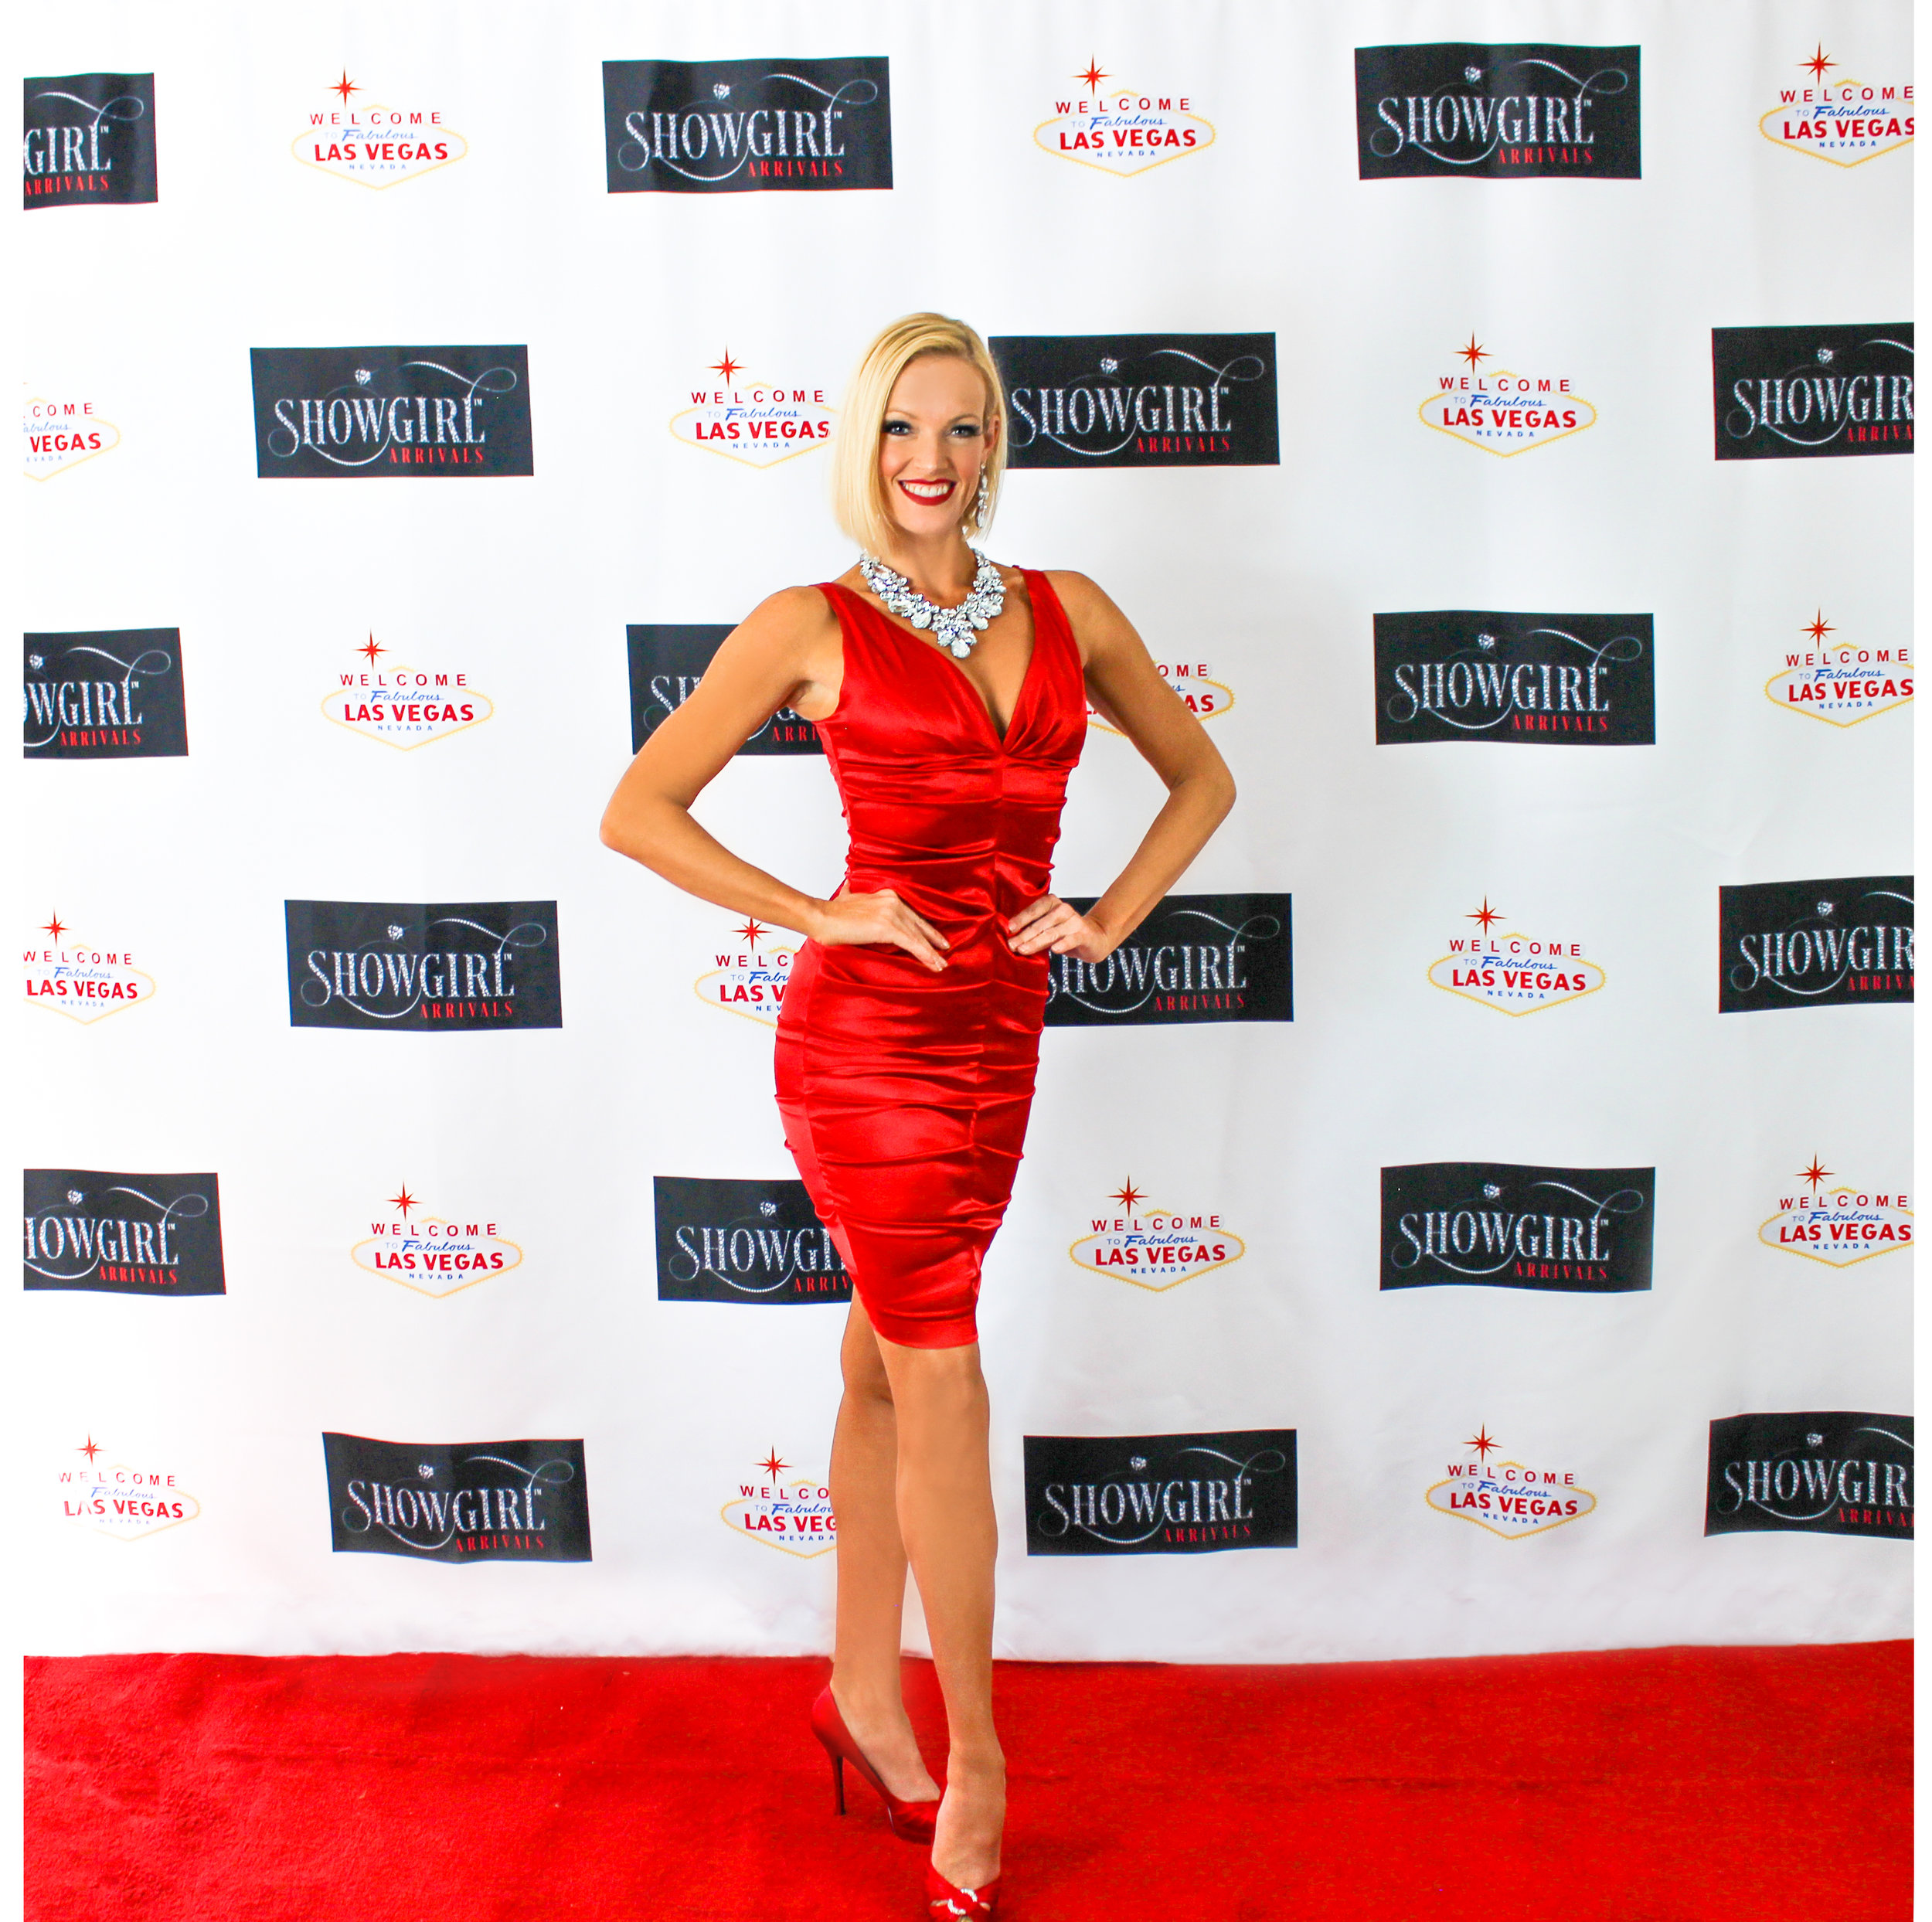 Encore - A Red Satin Dress